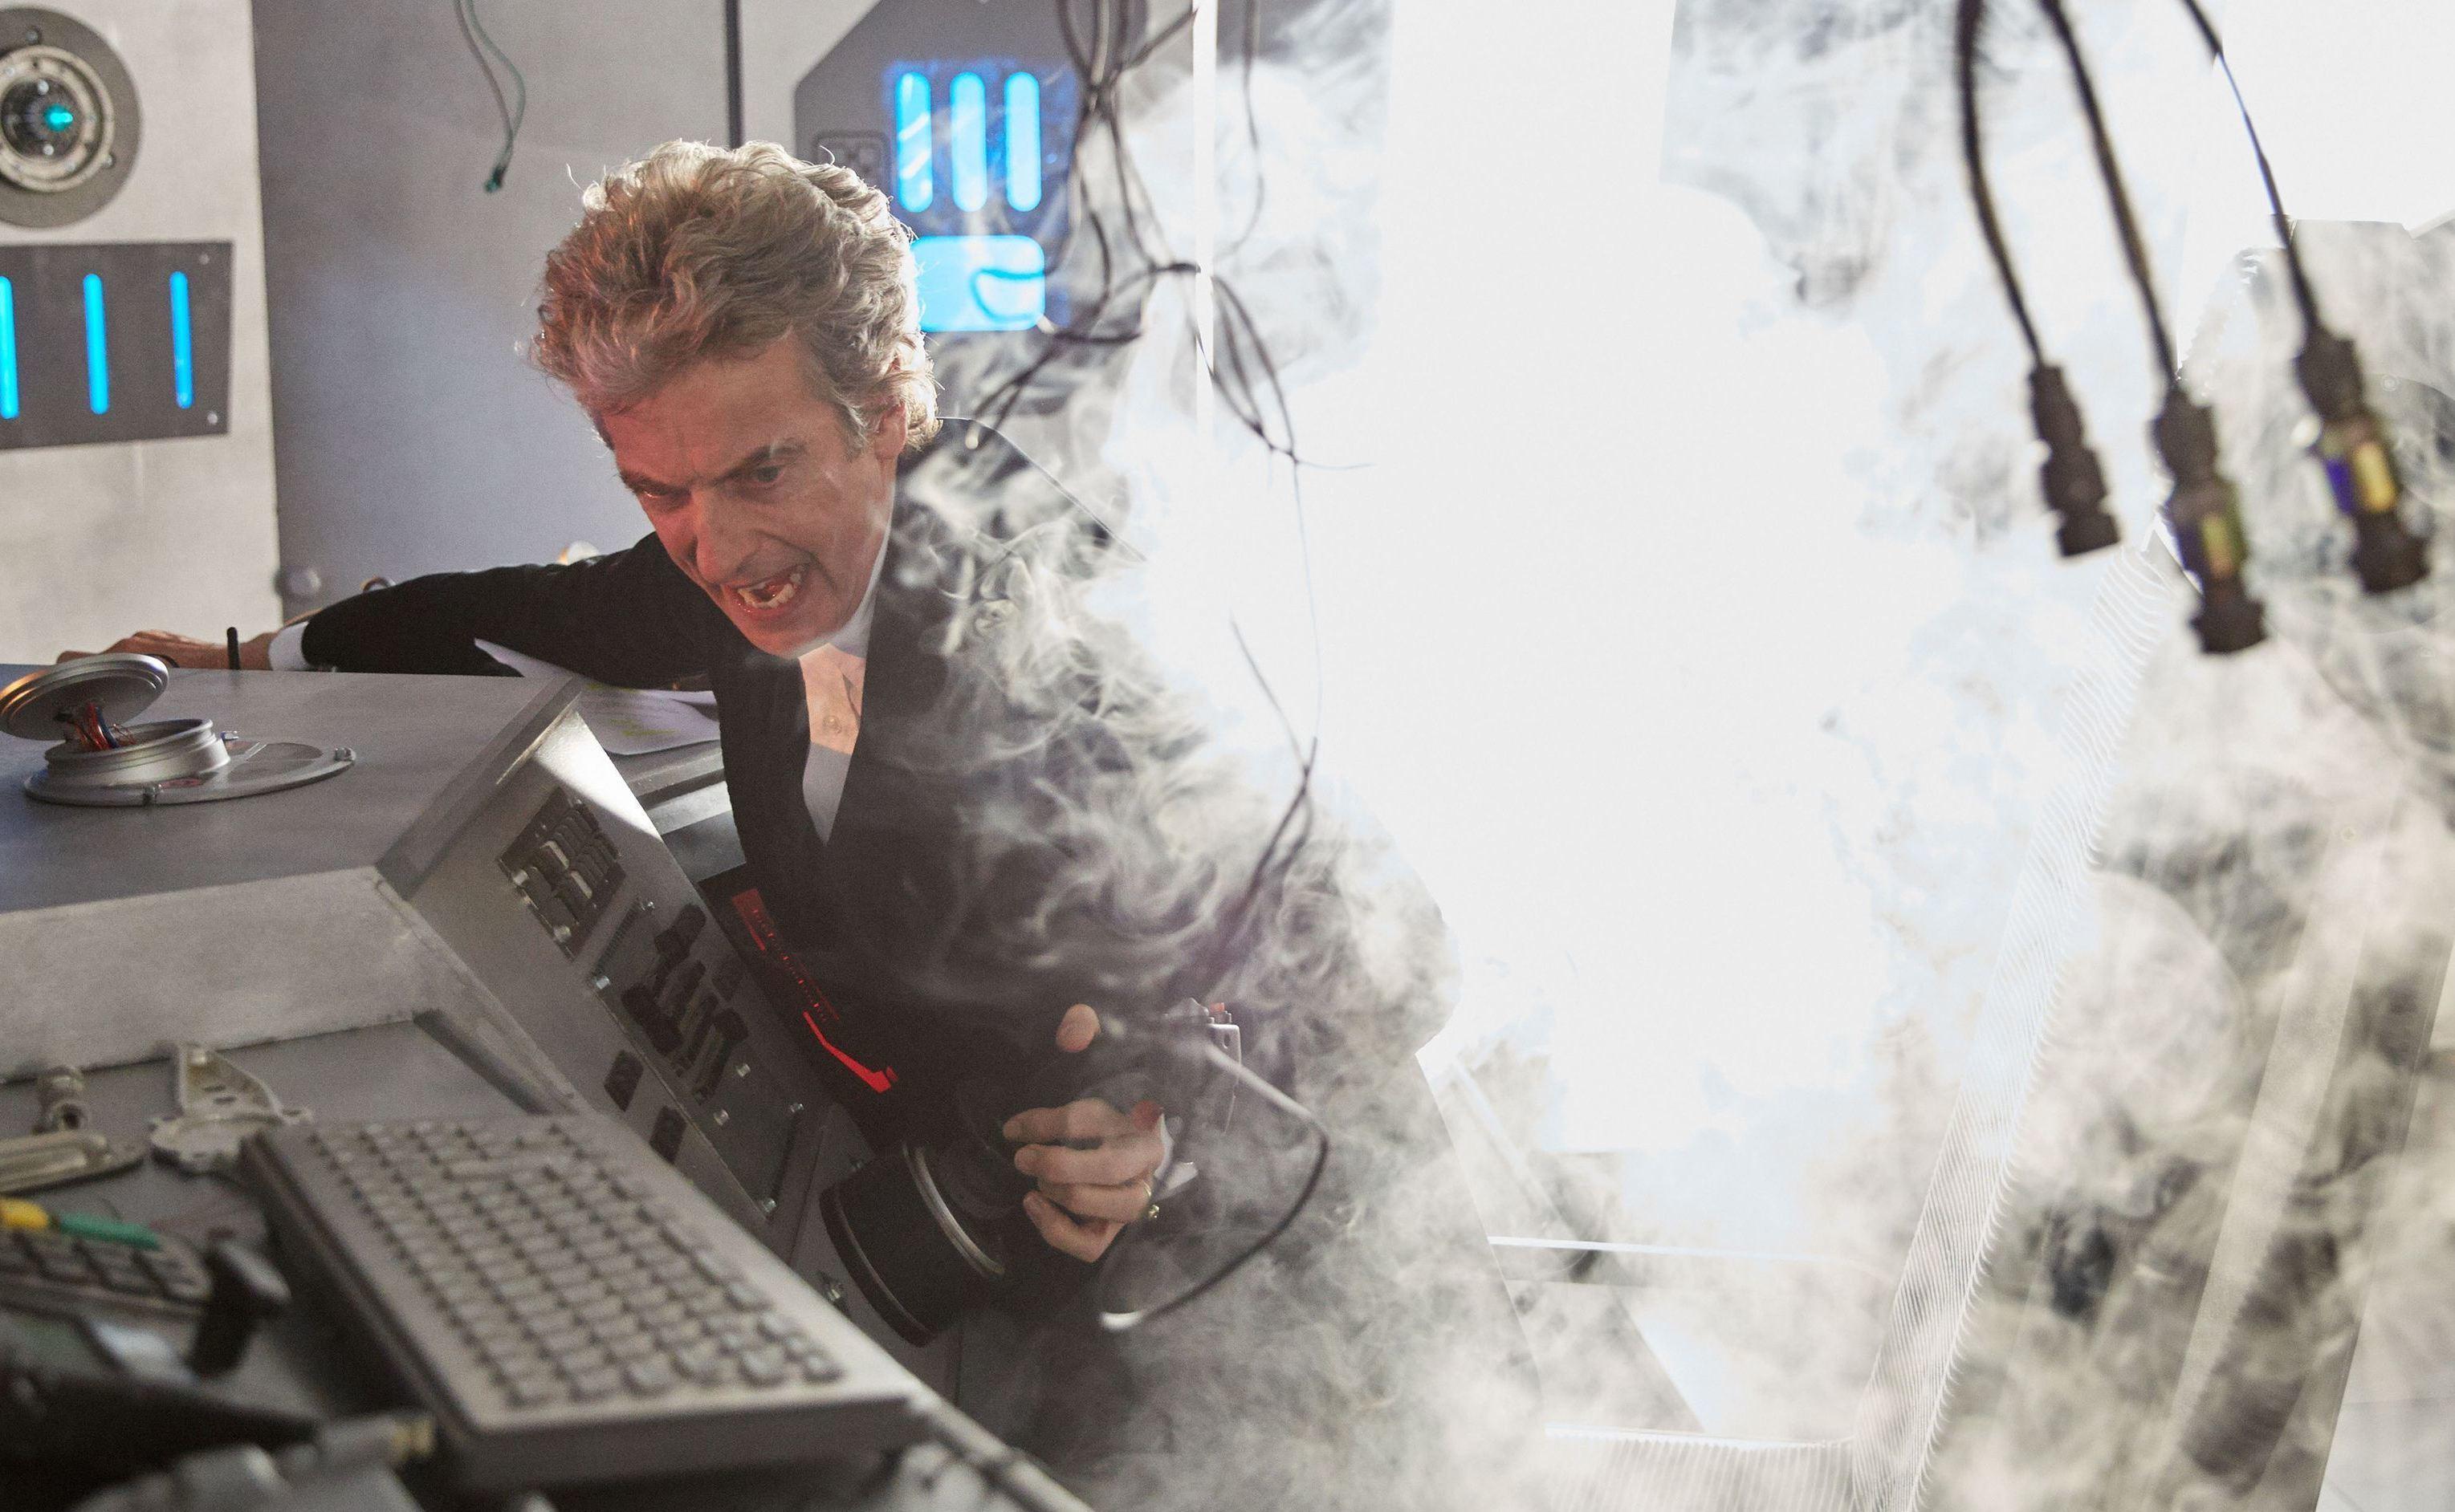 Doctor Who (PETER CAPALDI) - (C) BBC - Photographer: Simon Ridgway